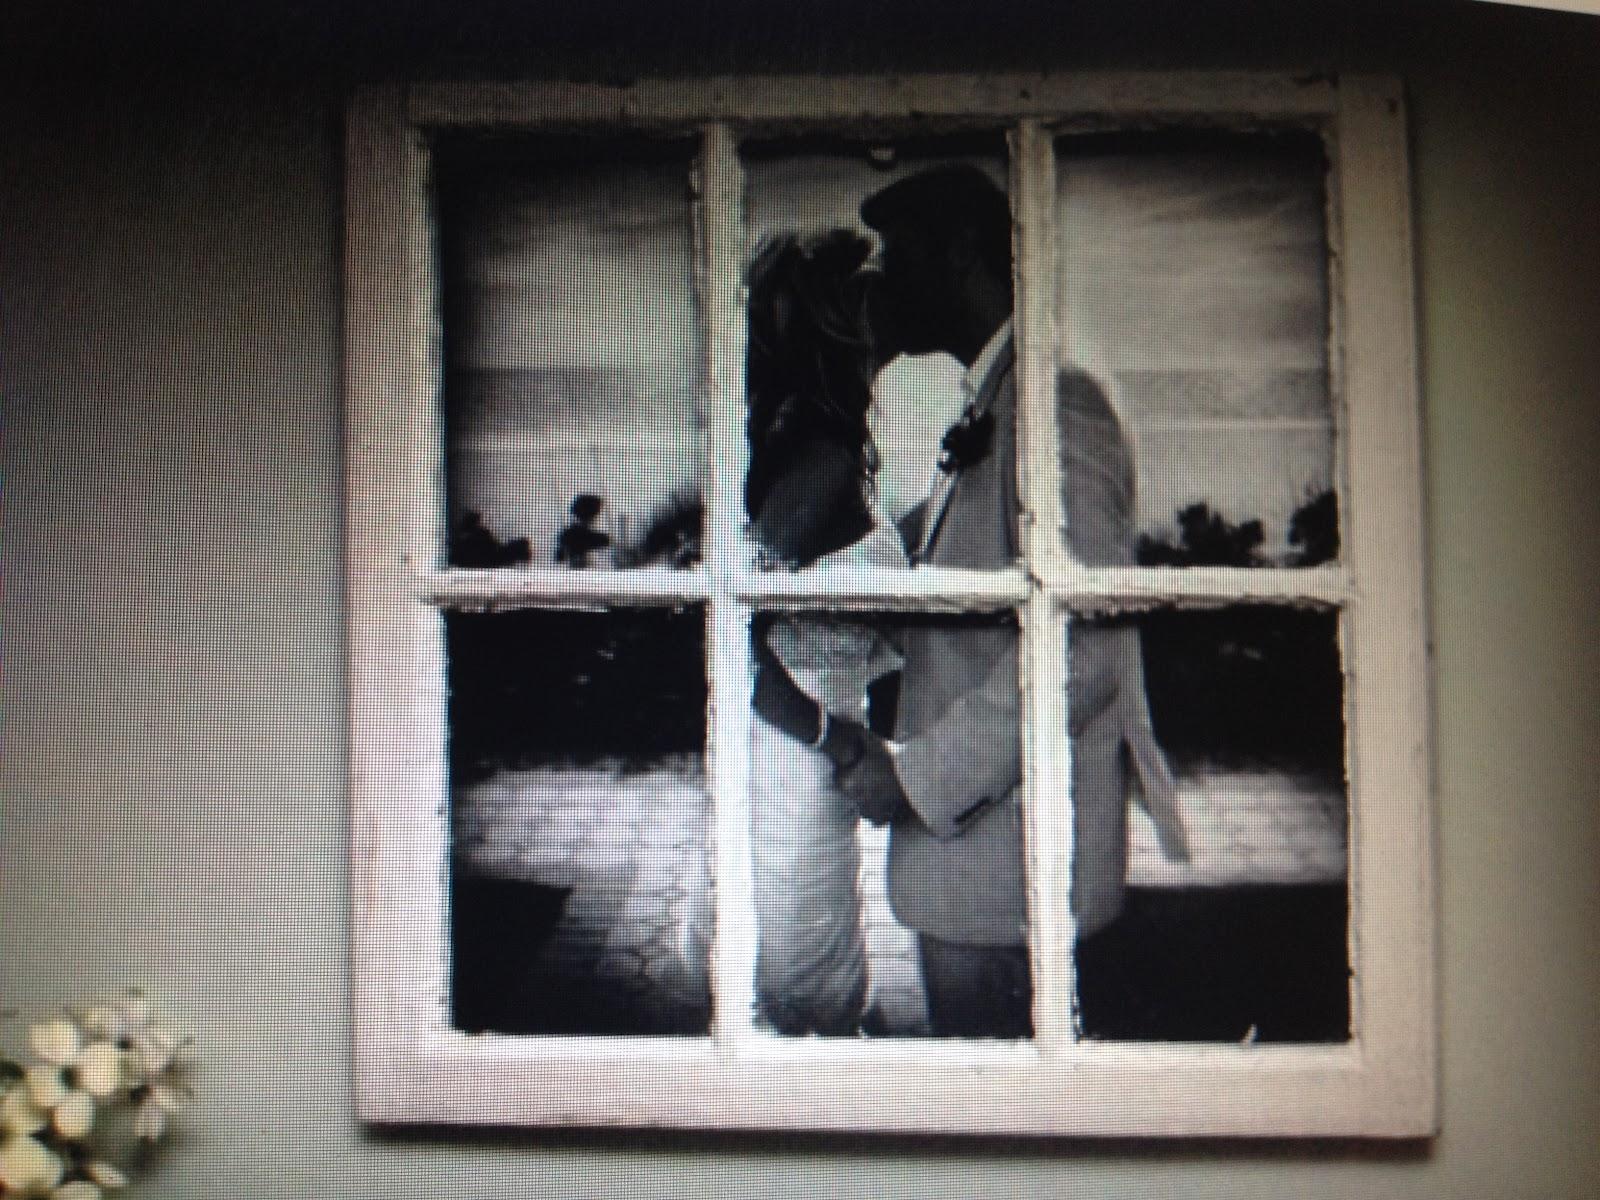 httppinterestcompin144678206749363135 - Window Pane Picture Frames